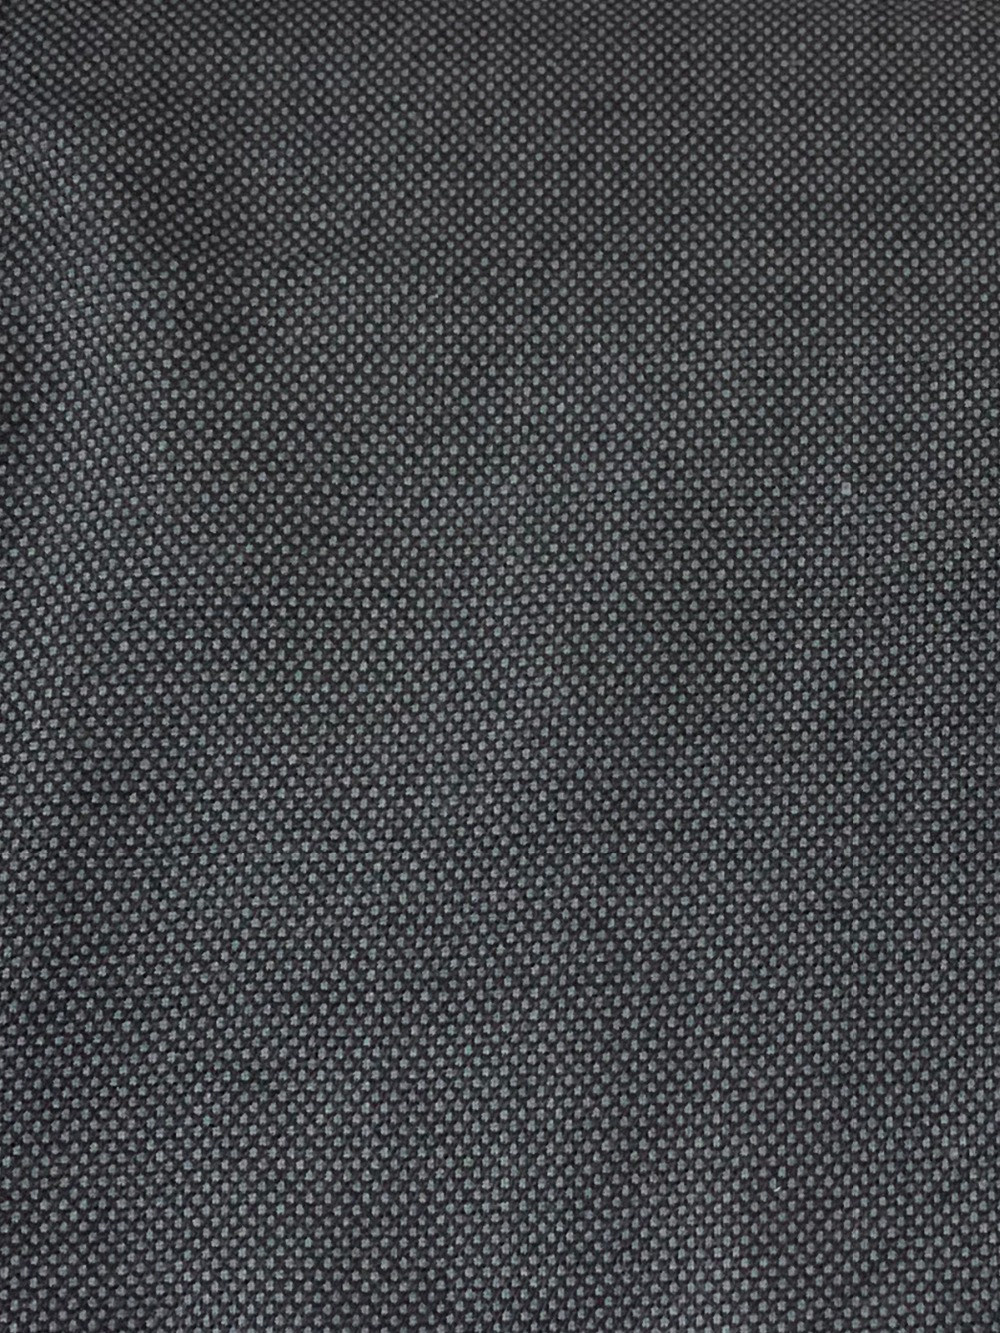 2019 Dark สีเทา Nailhead ชุดสมัยใหม่ Essential สำหรับปีสวมใส่รอบ Custom Made Slim Fit ชุดธุรกิจชุด Bestseller-ใน สูท จาก เสื้อผ้าผู้ชาย บน   3